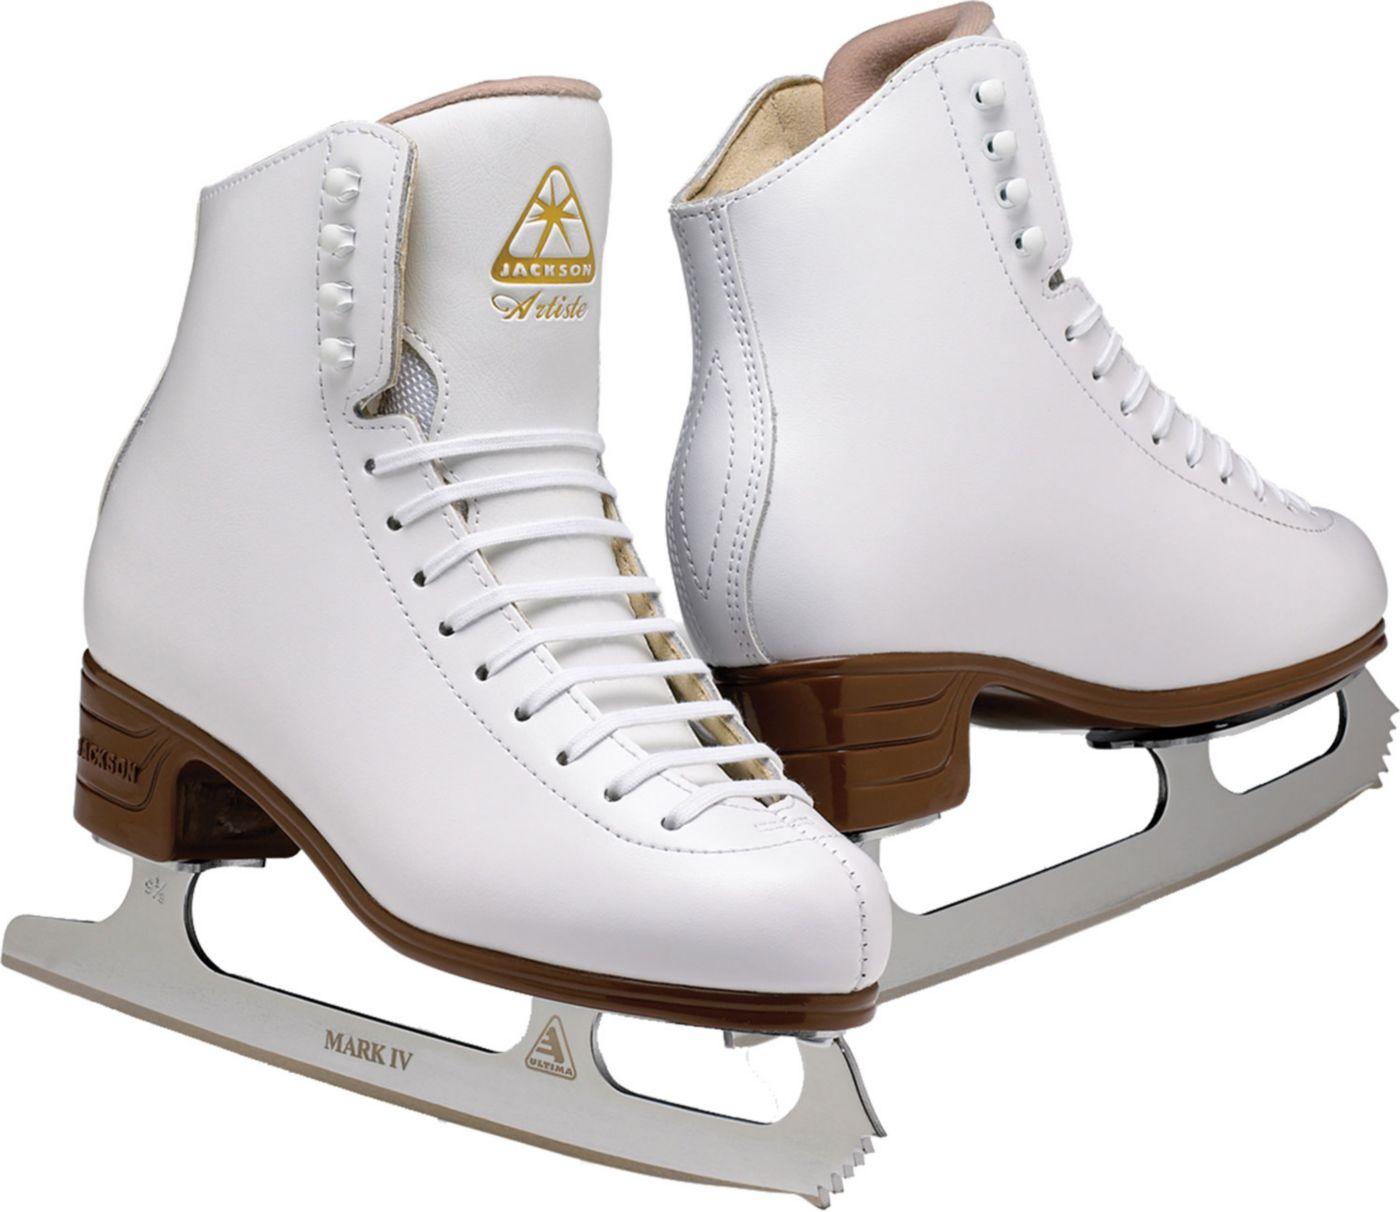 Jackson Ultima Women's Artiste Figure Skates